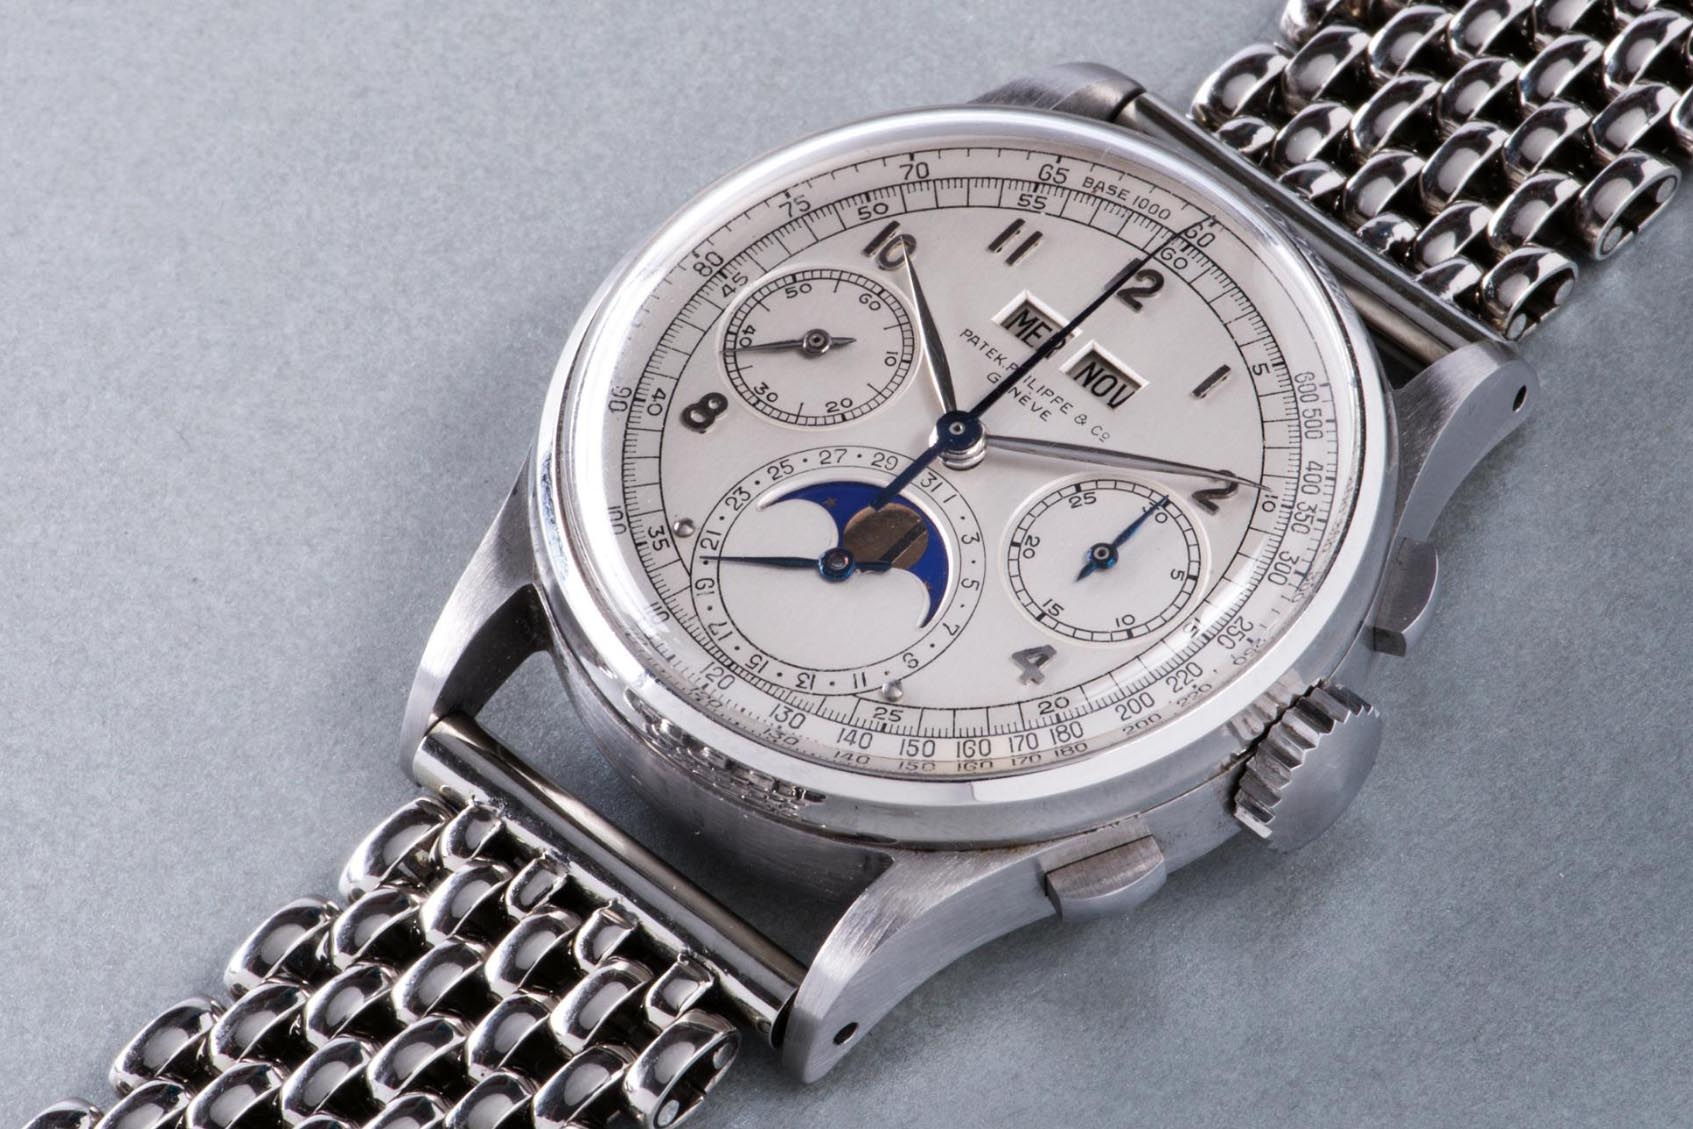 Patek Philippe Stainless Steel Perpetual Calendar Chronograph Wristwatch